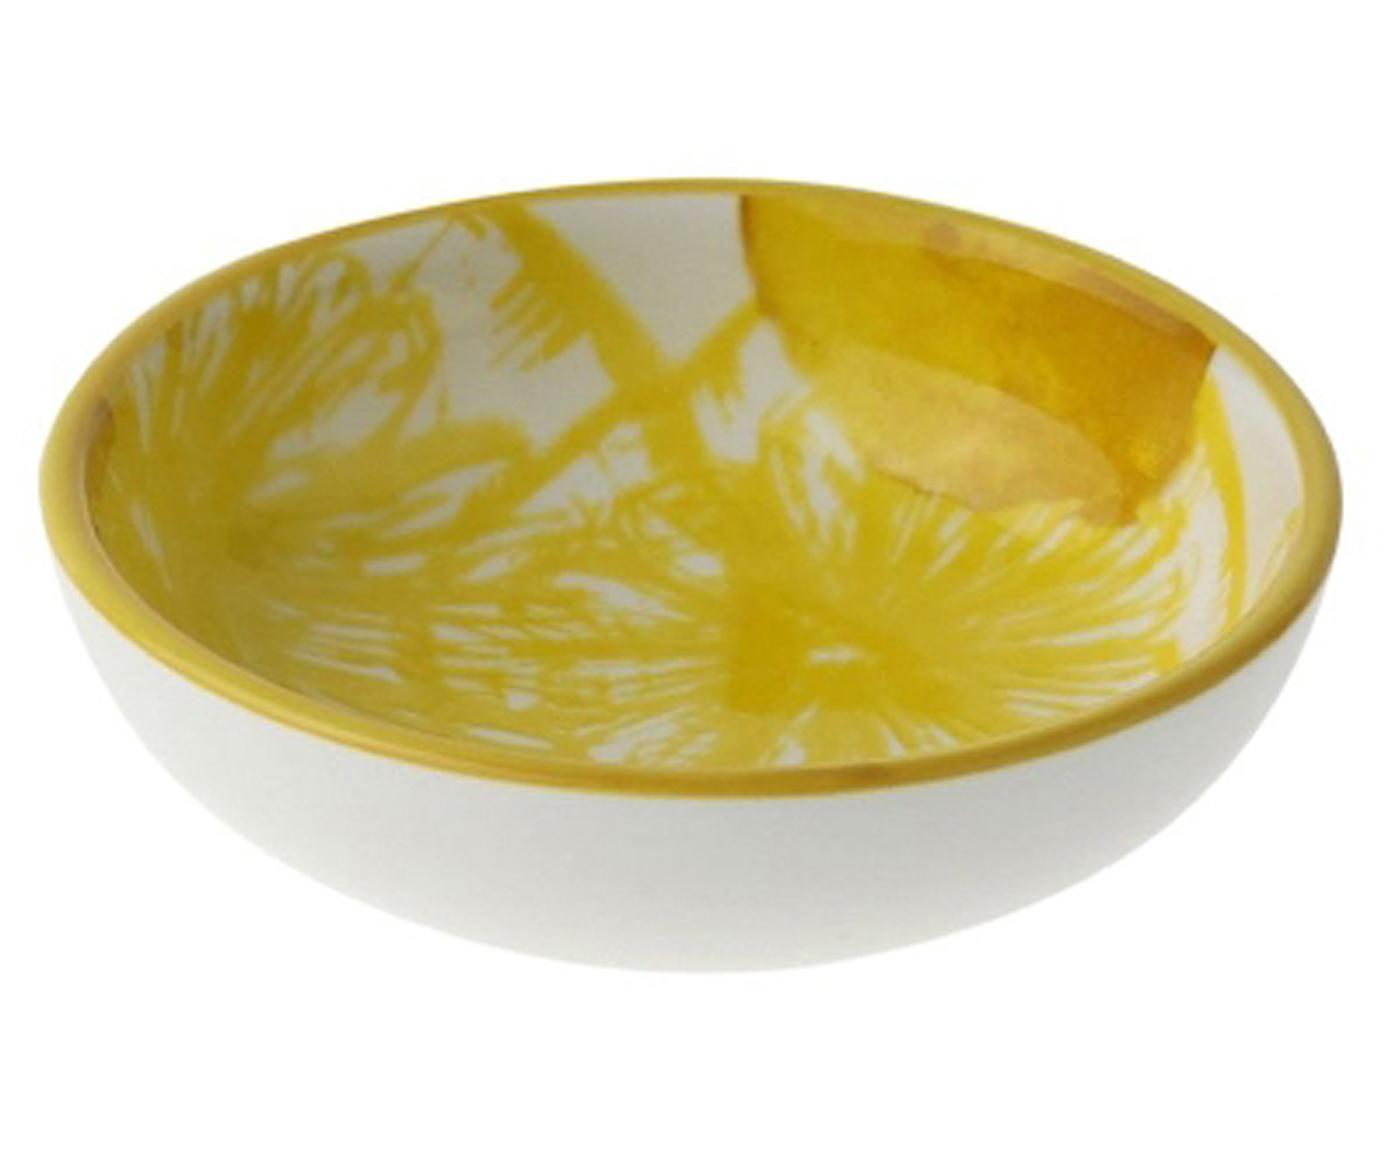 Dipschalen Lemon mit Zitronen-Motiv, 2 Stück, Porzellan, Weiß, Gelb, Ø 9 x H 3 cm